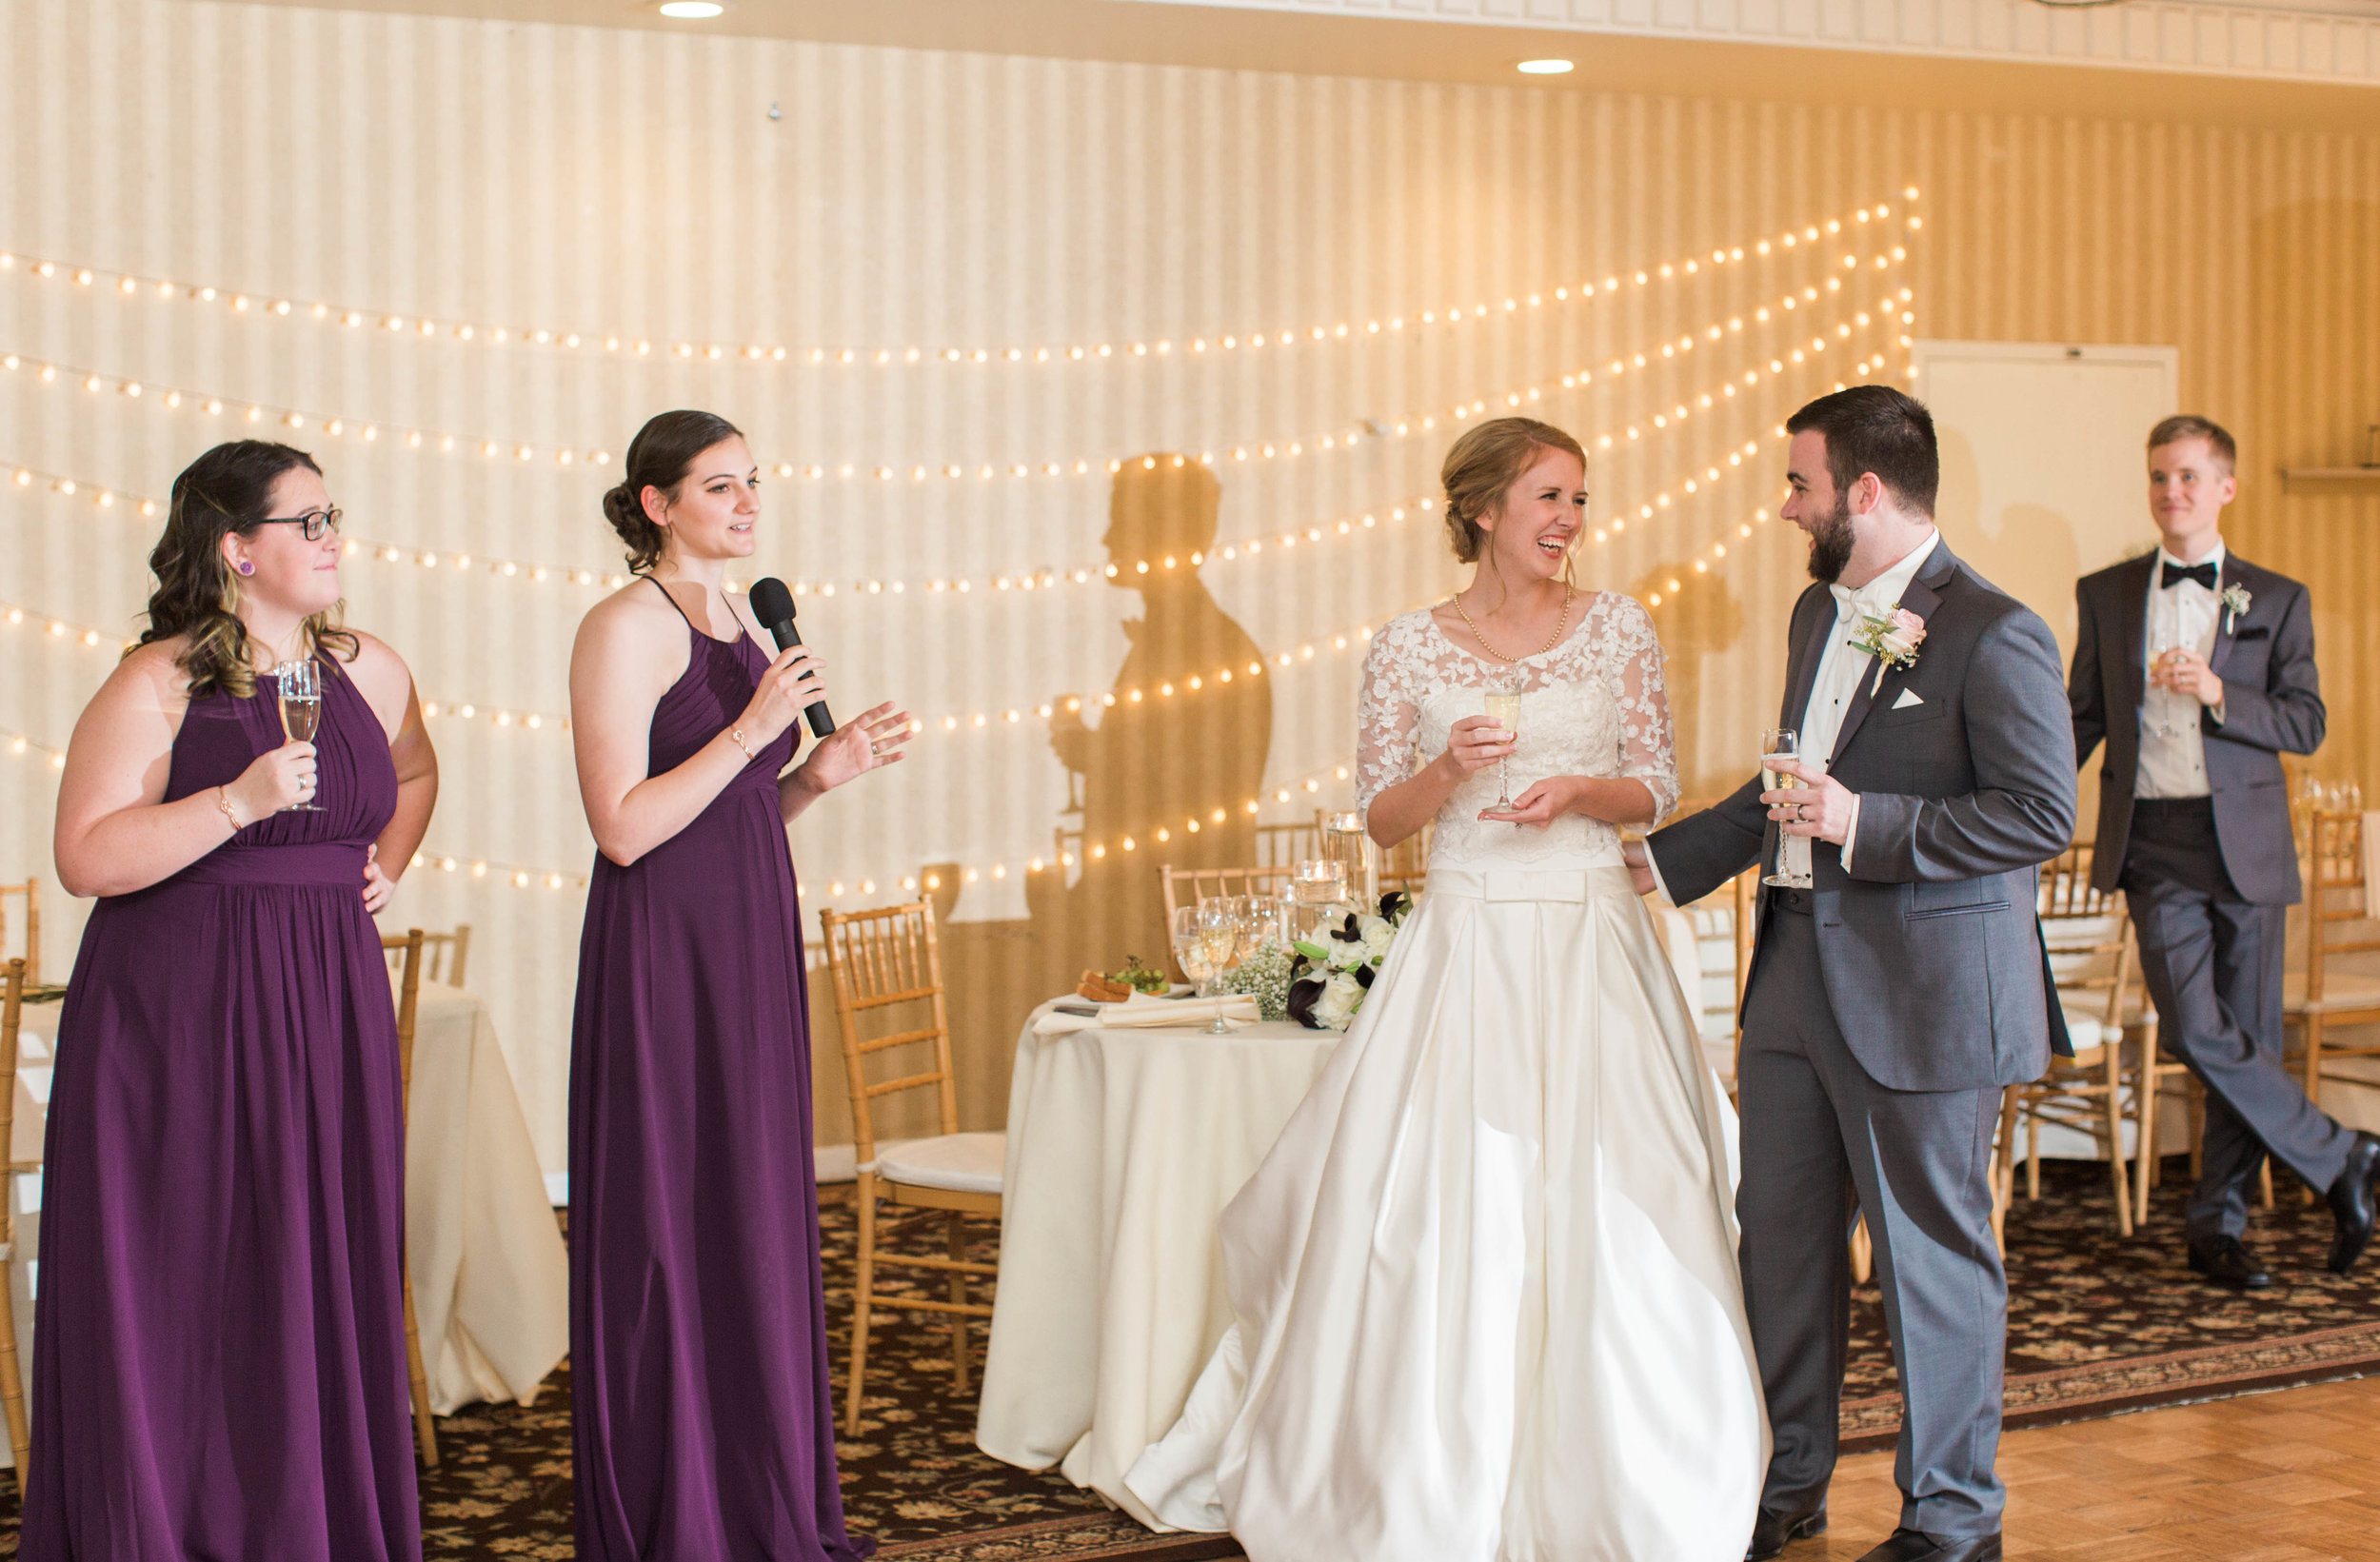 Beaumont Texas Country Club wedding-6215.jpg